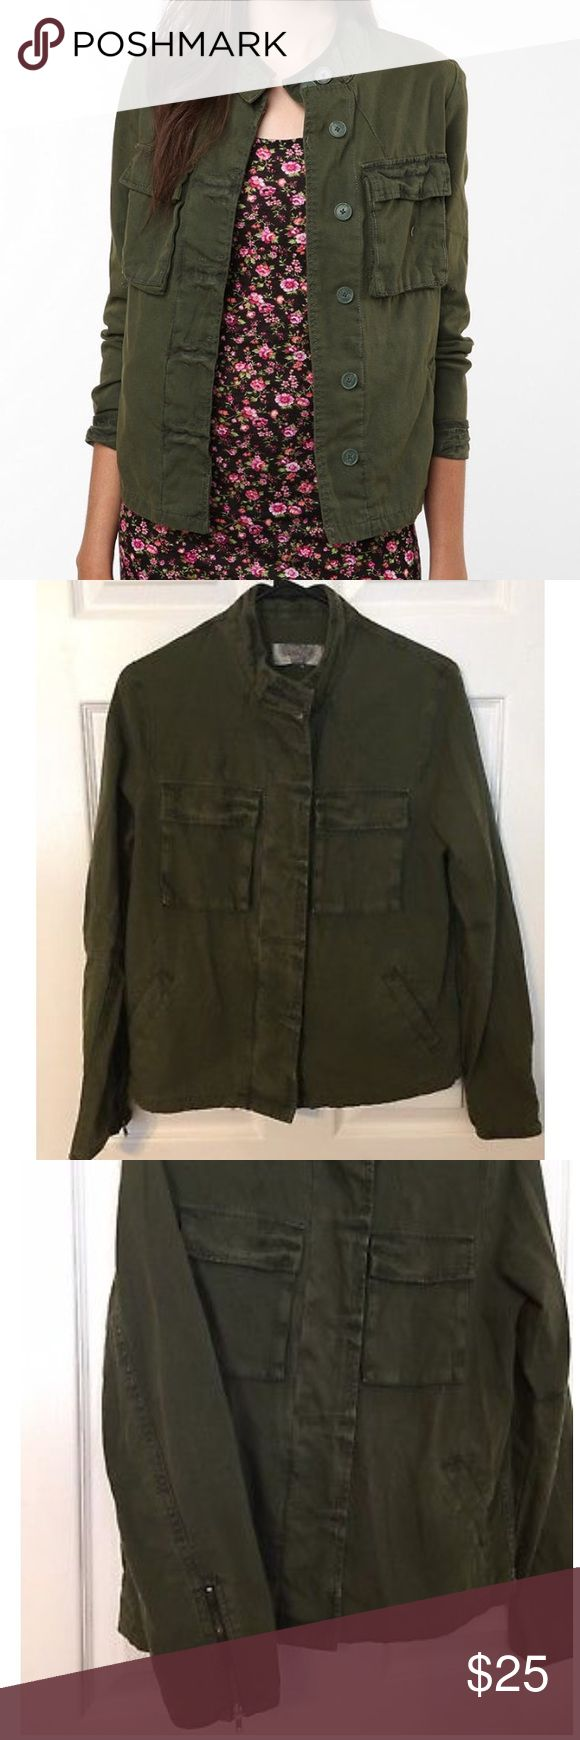 UO Ecote Green Military Jacket Small Urban Outfitters Ecote Army Green Military Jacket Small. 🤘🏼 30% off 2 or more in closet Ecote Jackets & Coats Utility Jackets